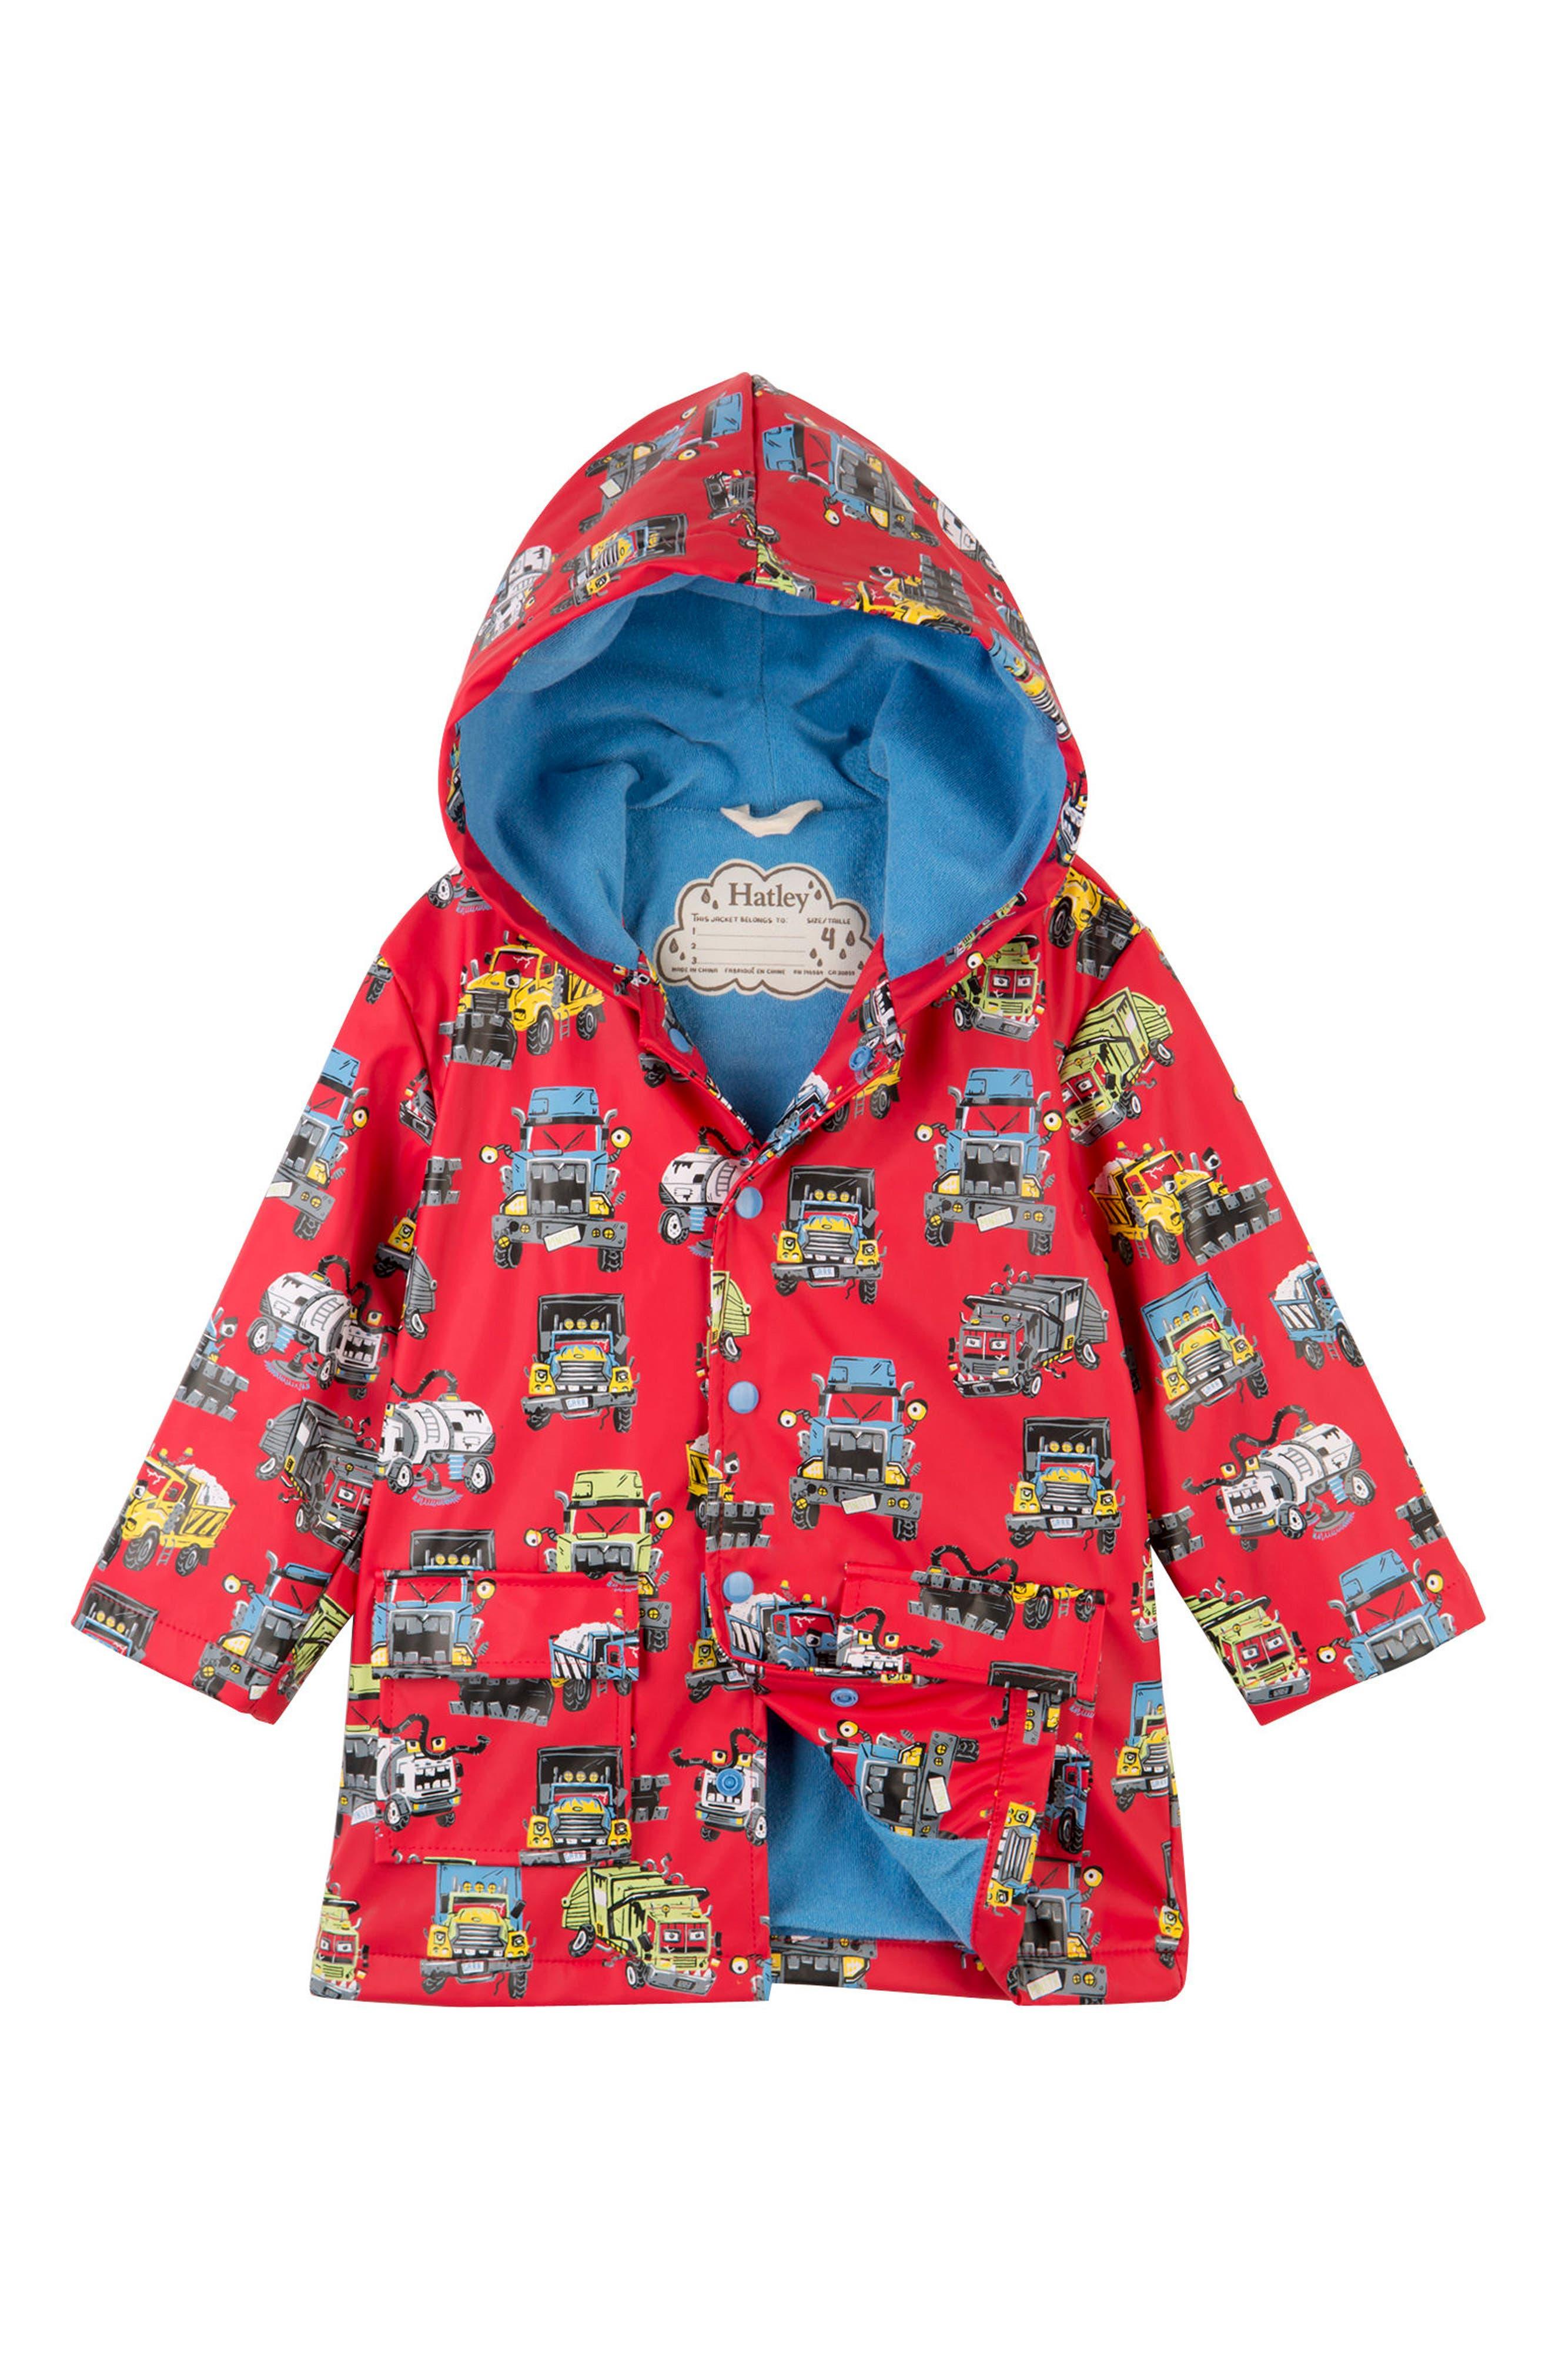 HATLEY, Monster Trucks Hooded Waterproof Raincoat, Main thumbnail 1, color, 600